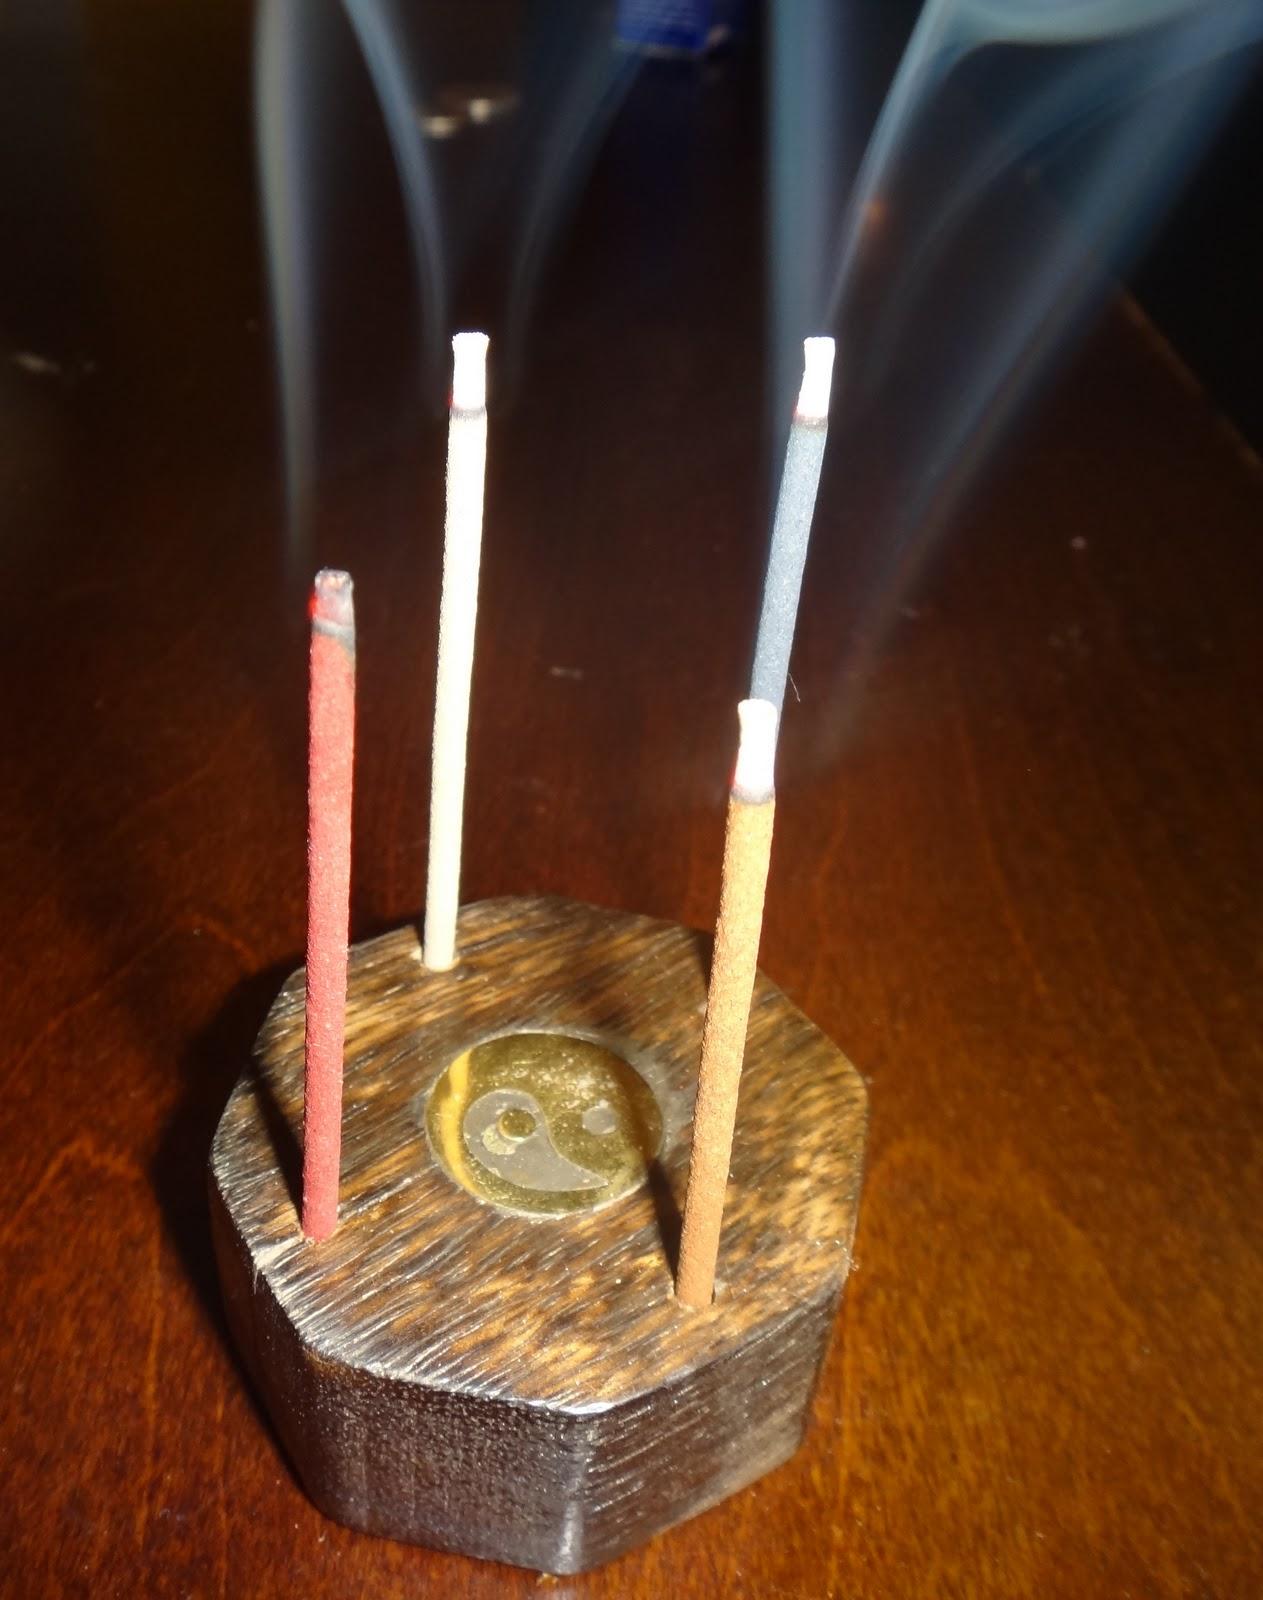 My Perfume Diaries: Burning Incense